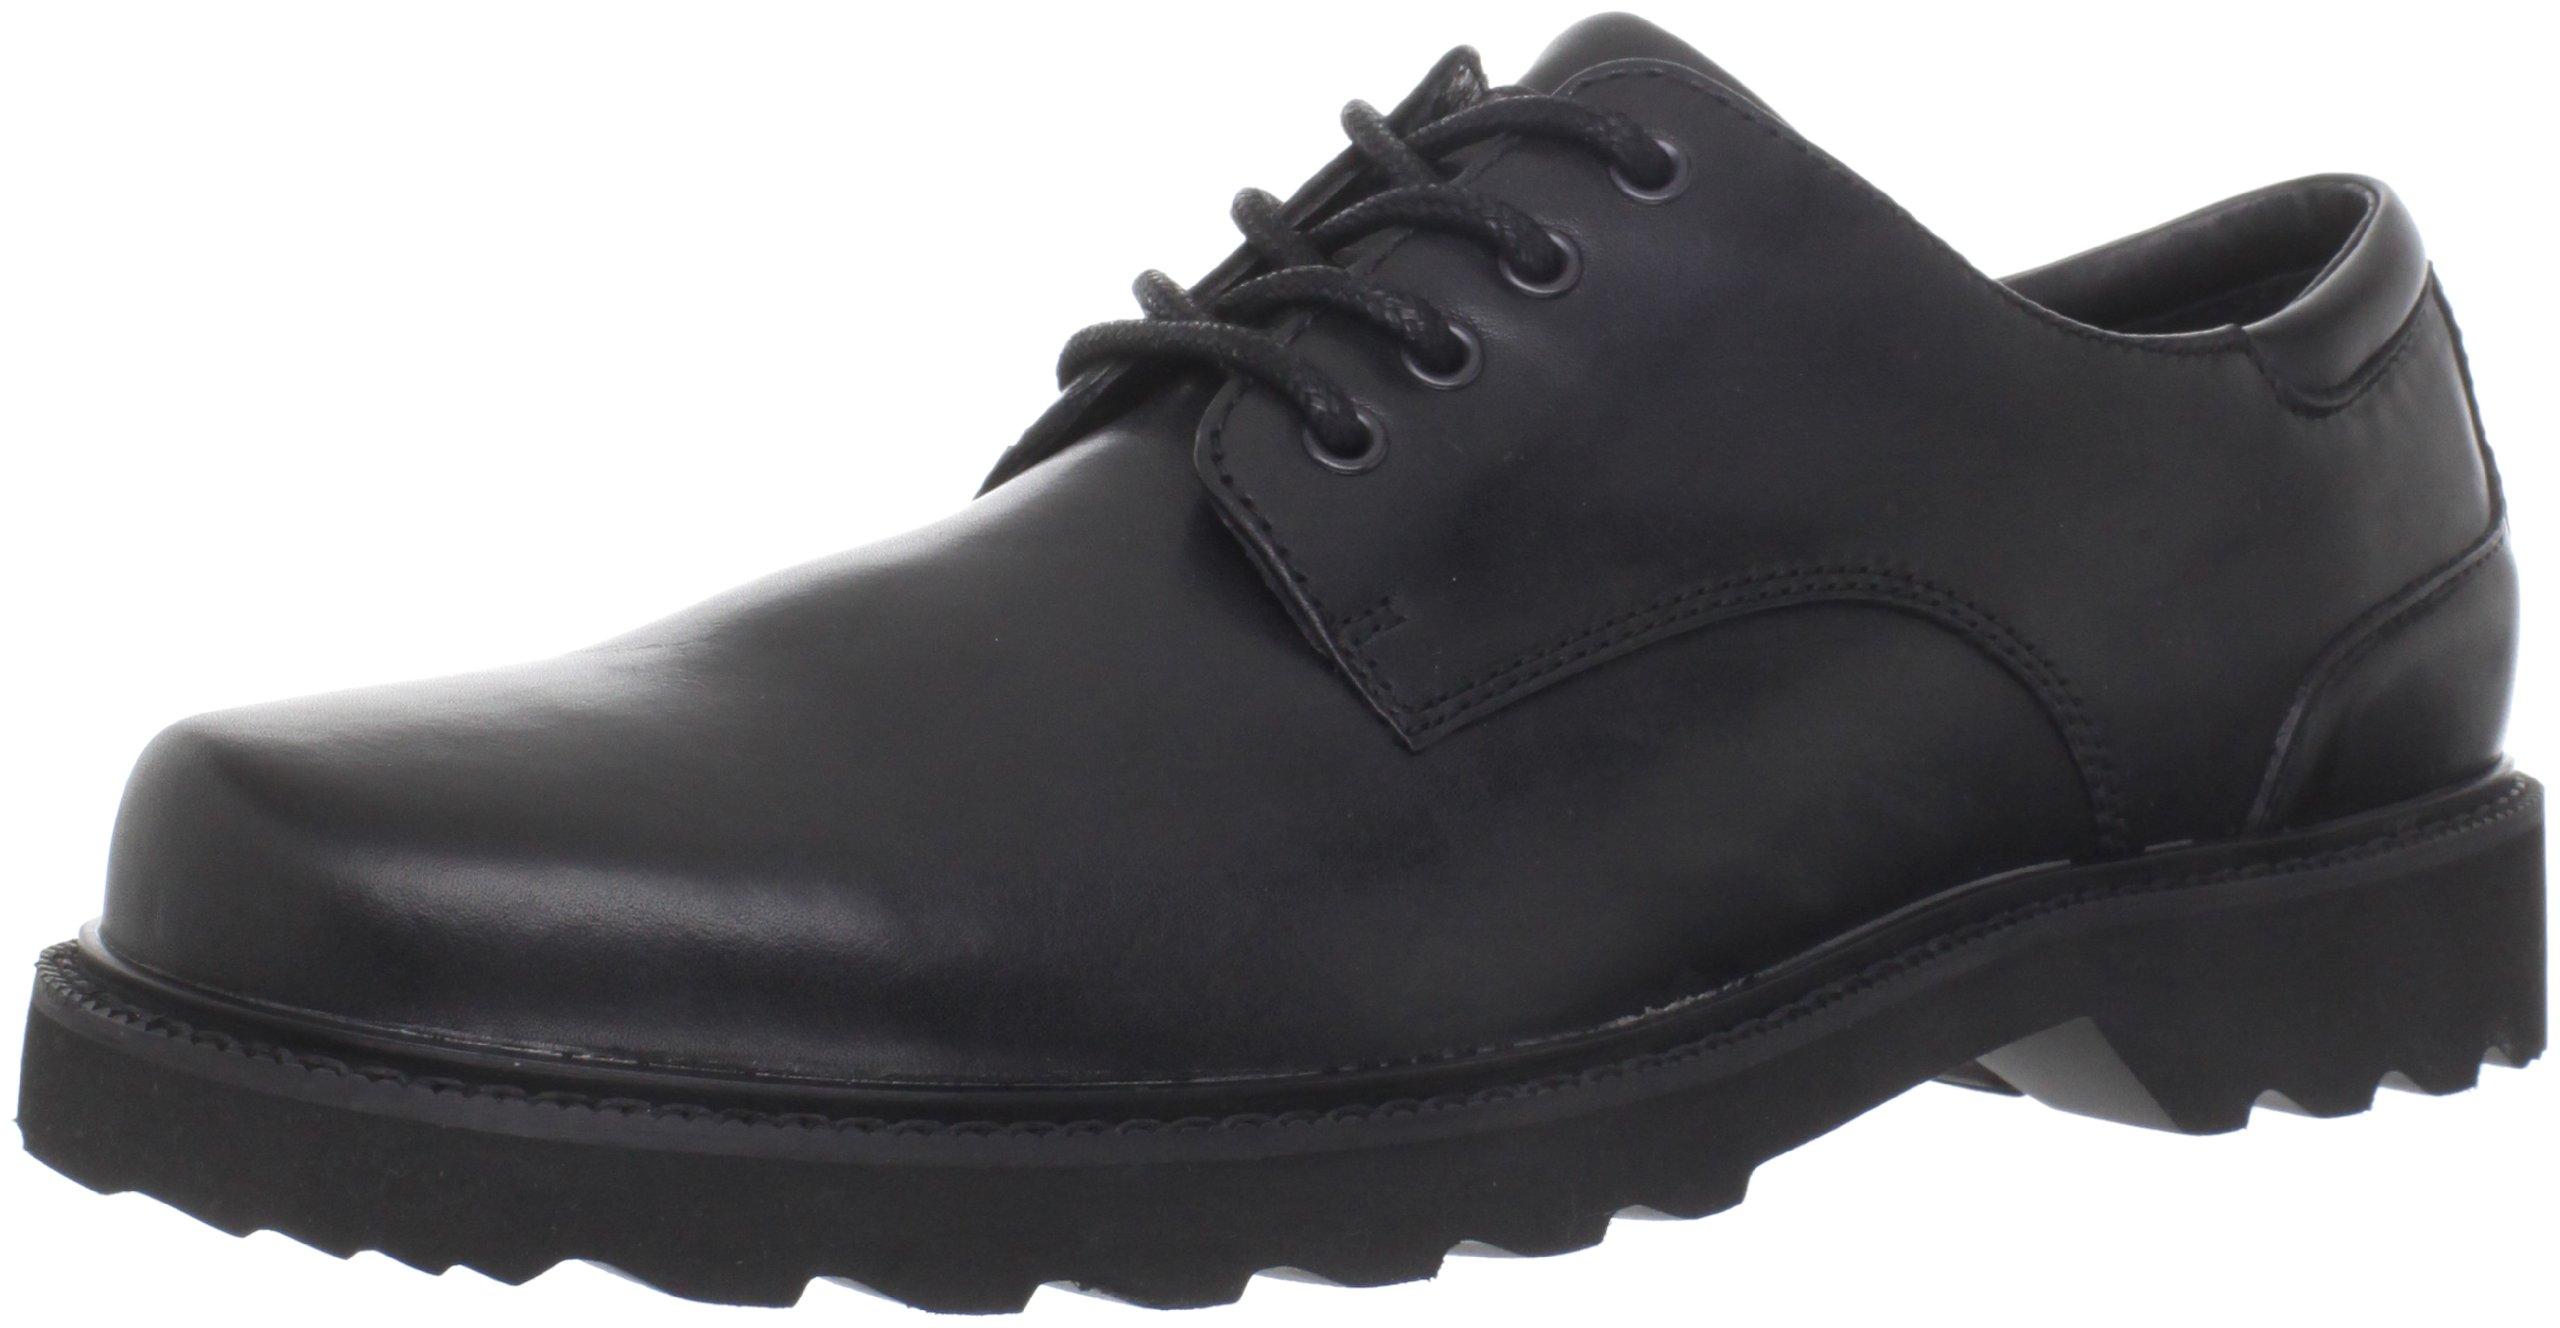 Rockport Men's Northfield Oxford-Black-12 M